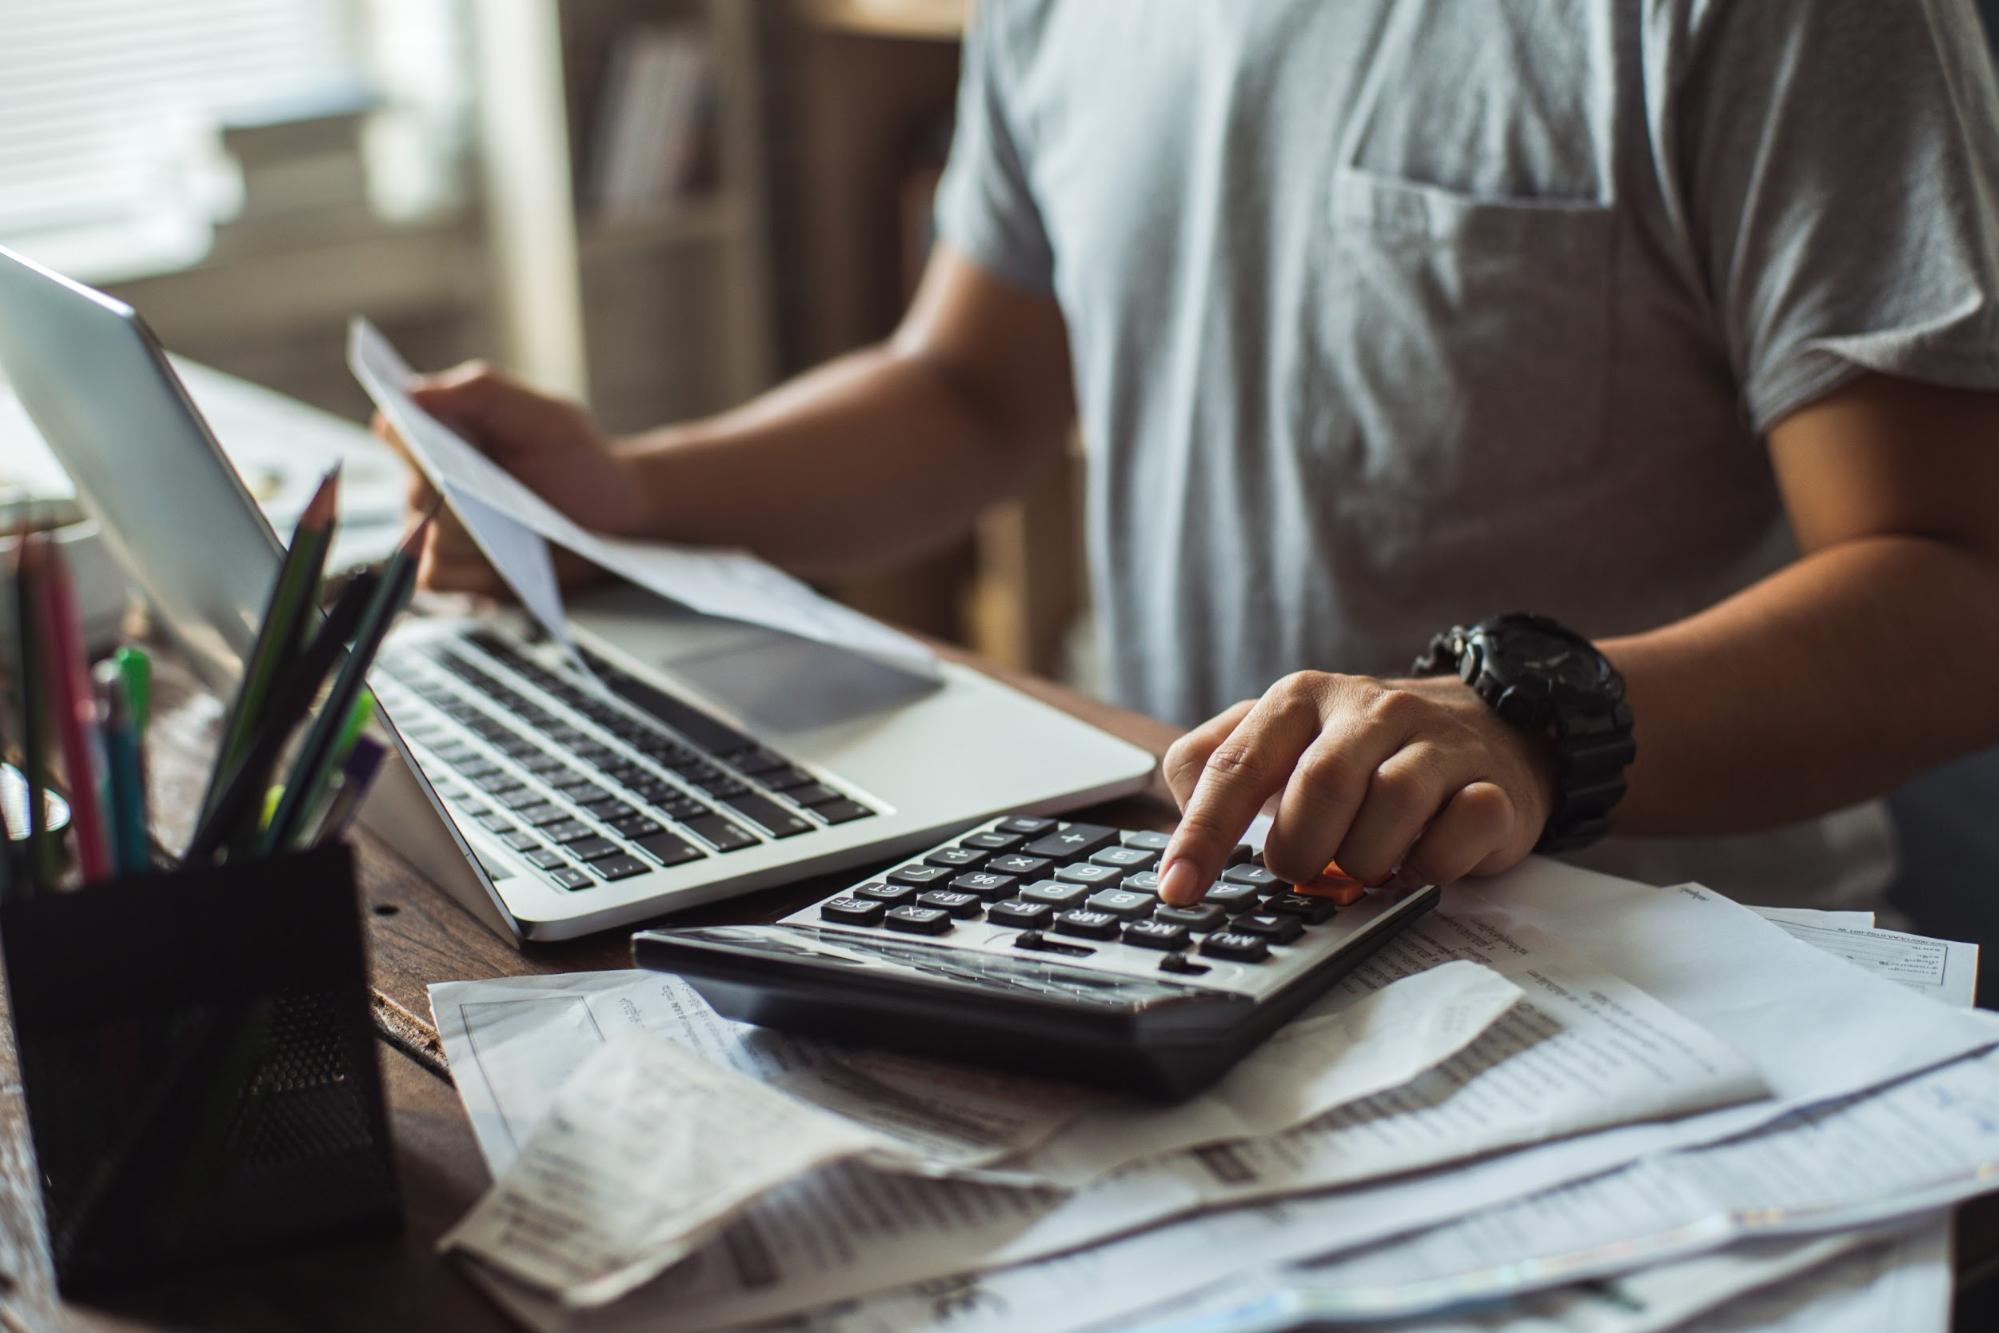 Man computing his bills using a calculator at his desk